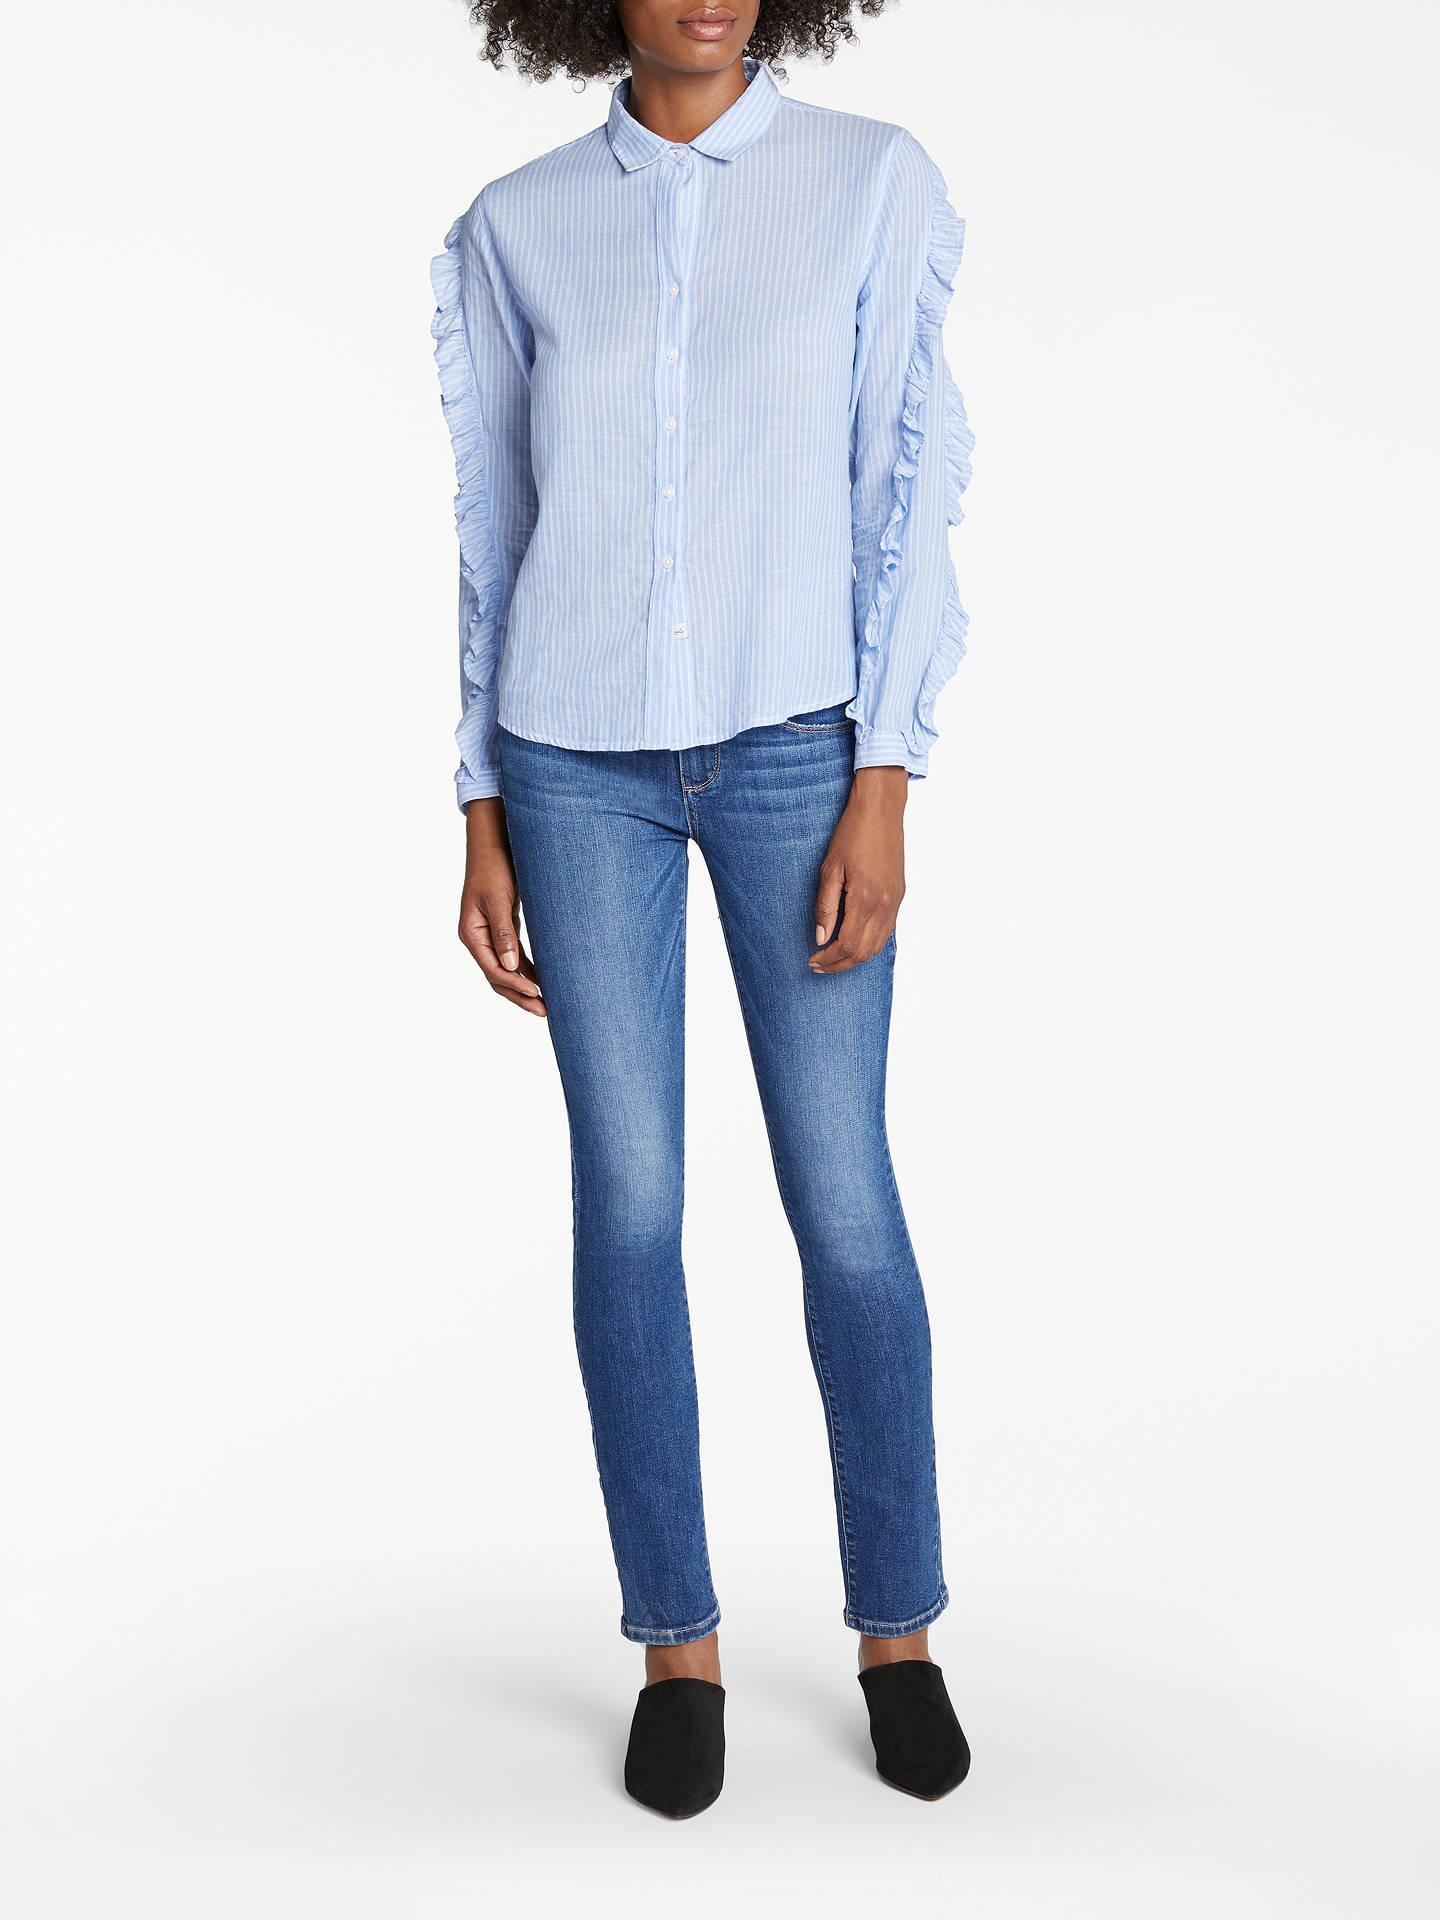 fcbabfa2a58b53 ... Buy Rails Lizzi Ruffle Sleeve Shirt, Bellflower/White Mini Stripe, XS  Online at ...